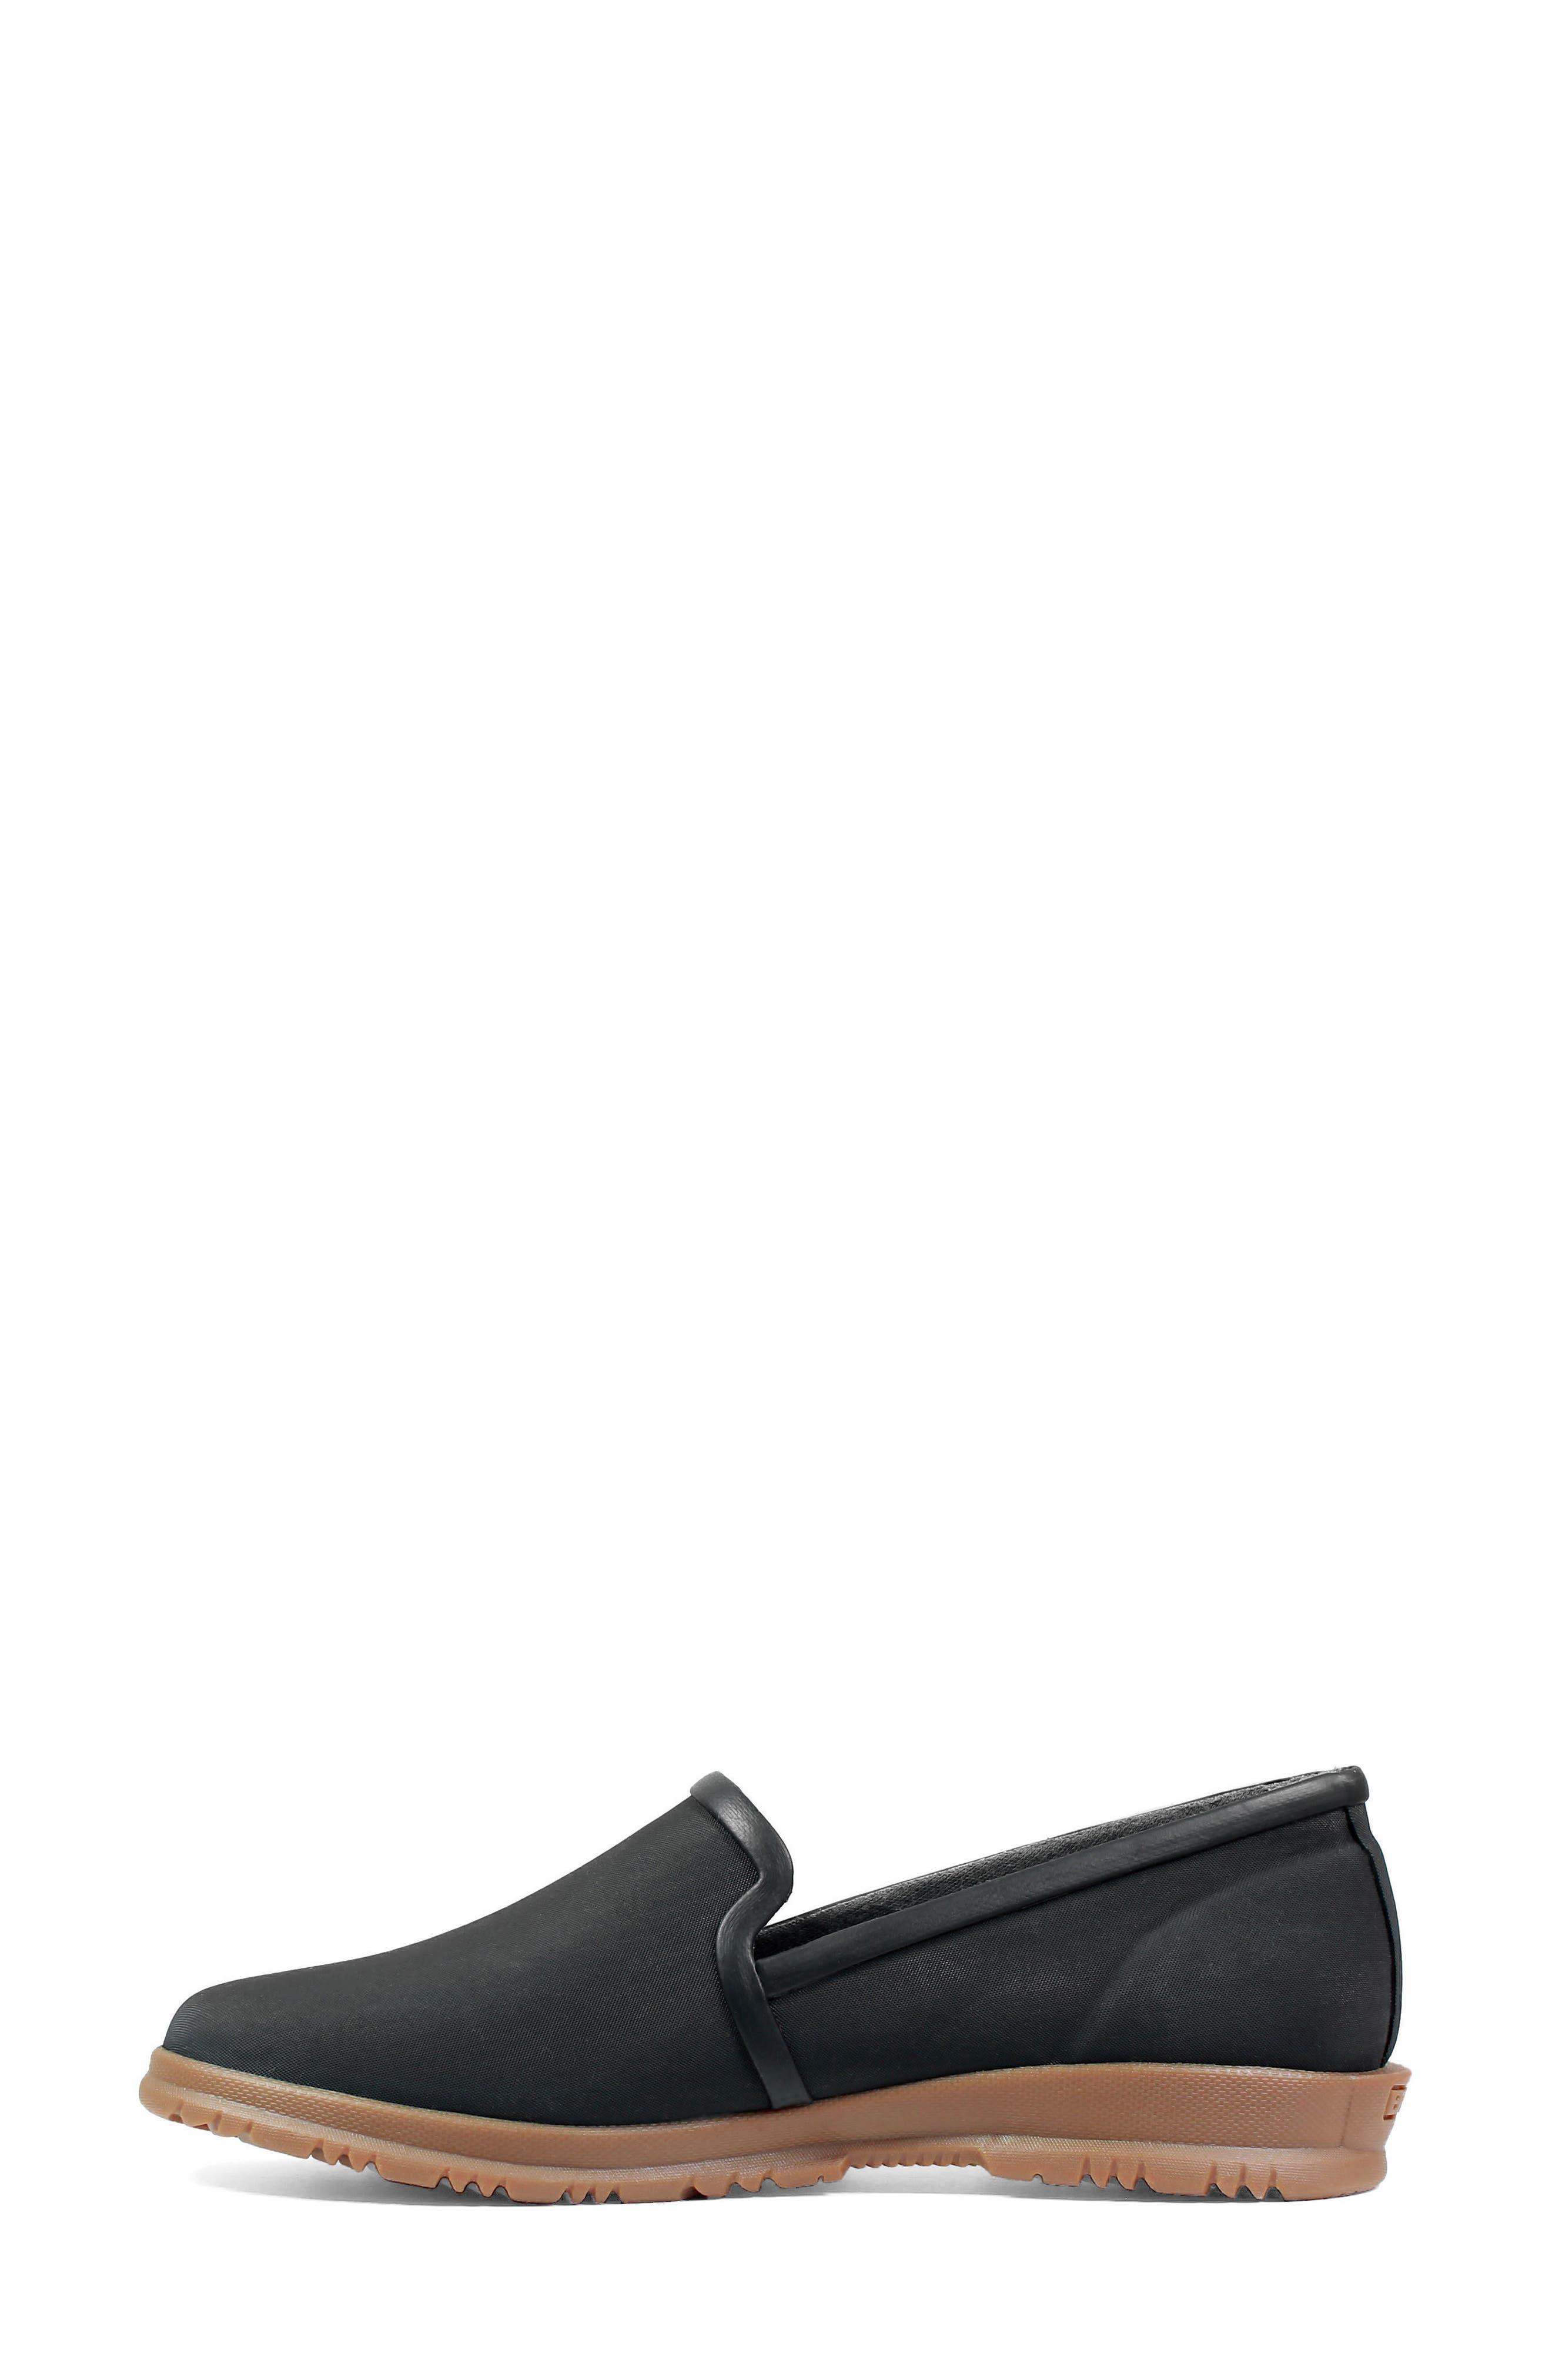 BOGS, Sweetpea Waterproof Slip-On Sneaker, Alternate thumbnail 3, color, 001